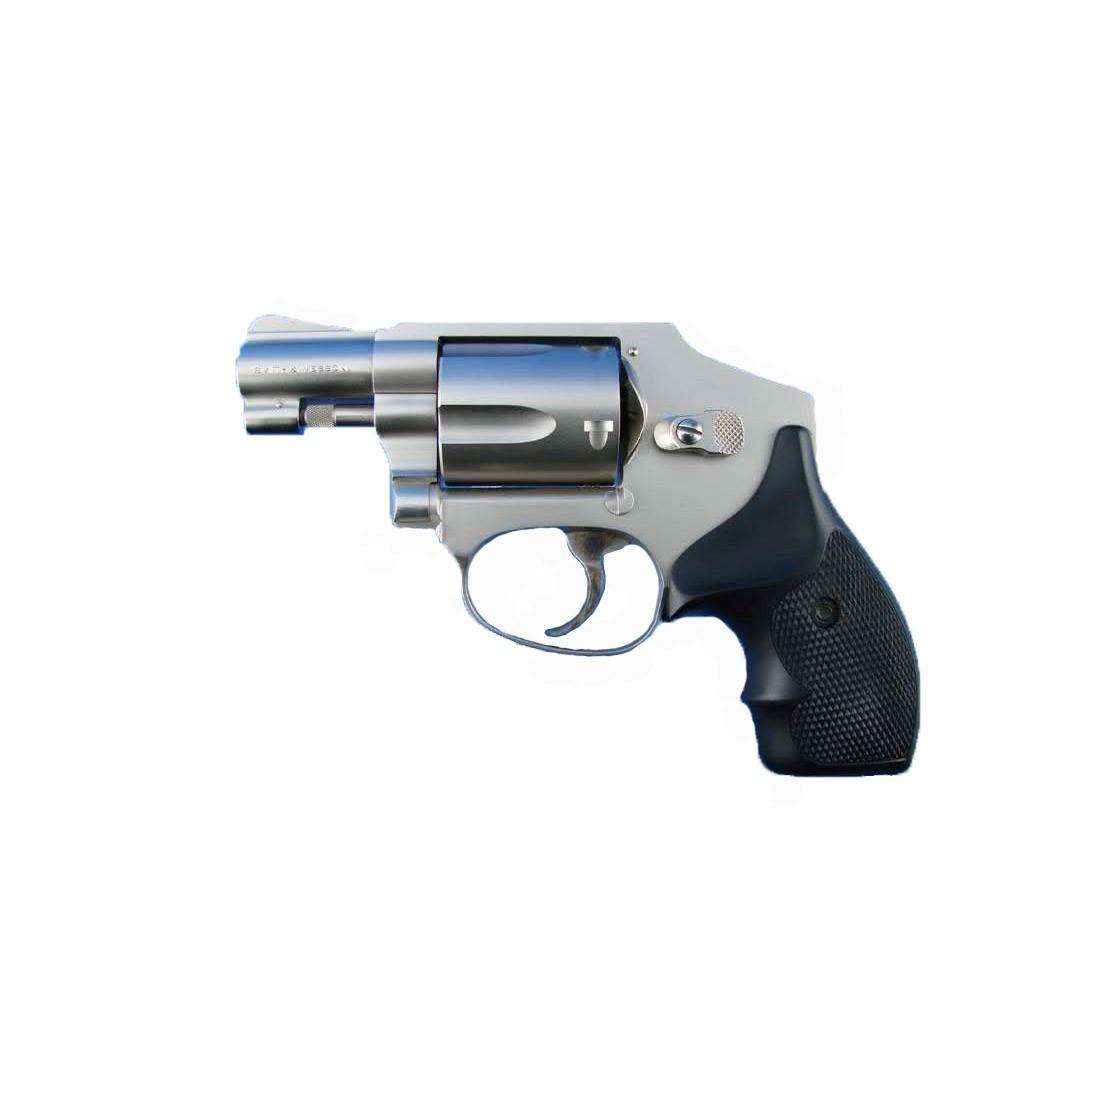 "Tanaka S&W M442 CENTENNIAL Airweight 2"" Nickel Revolver"